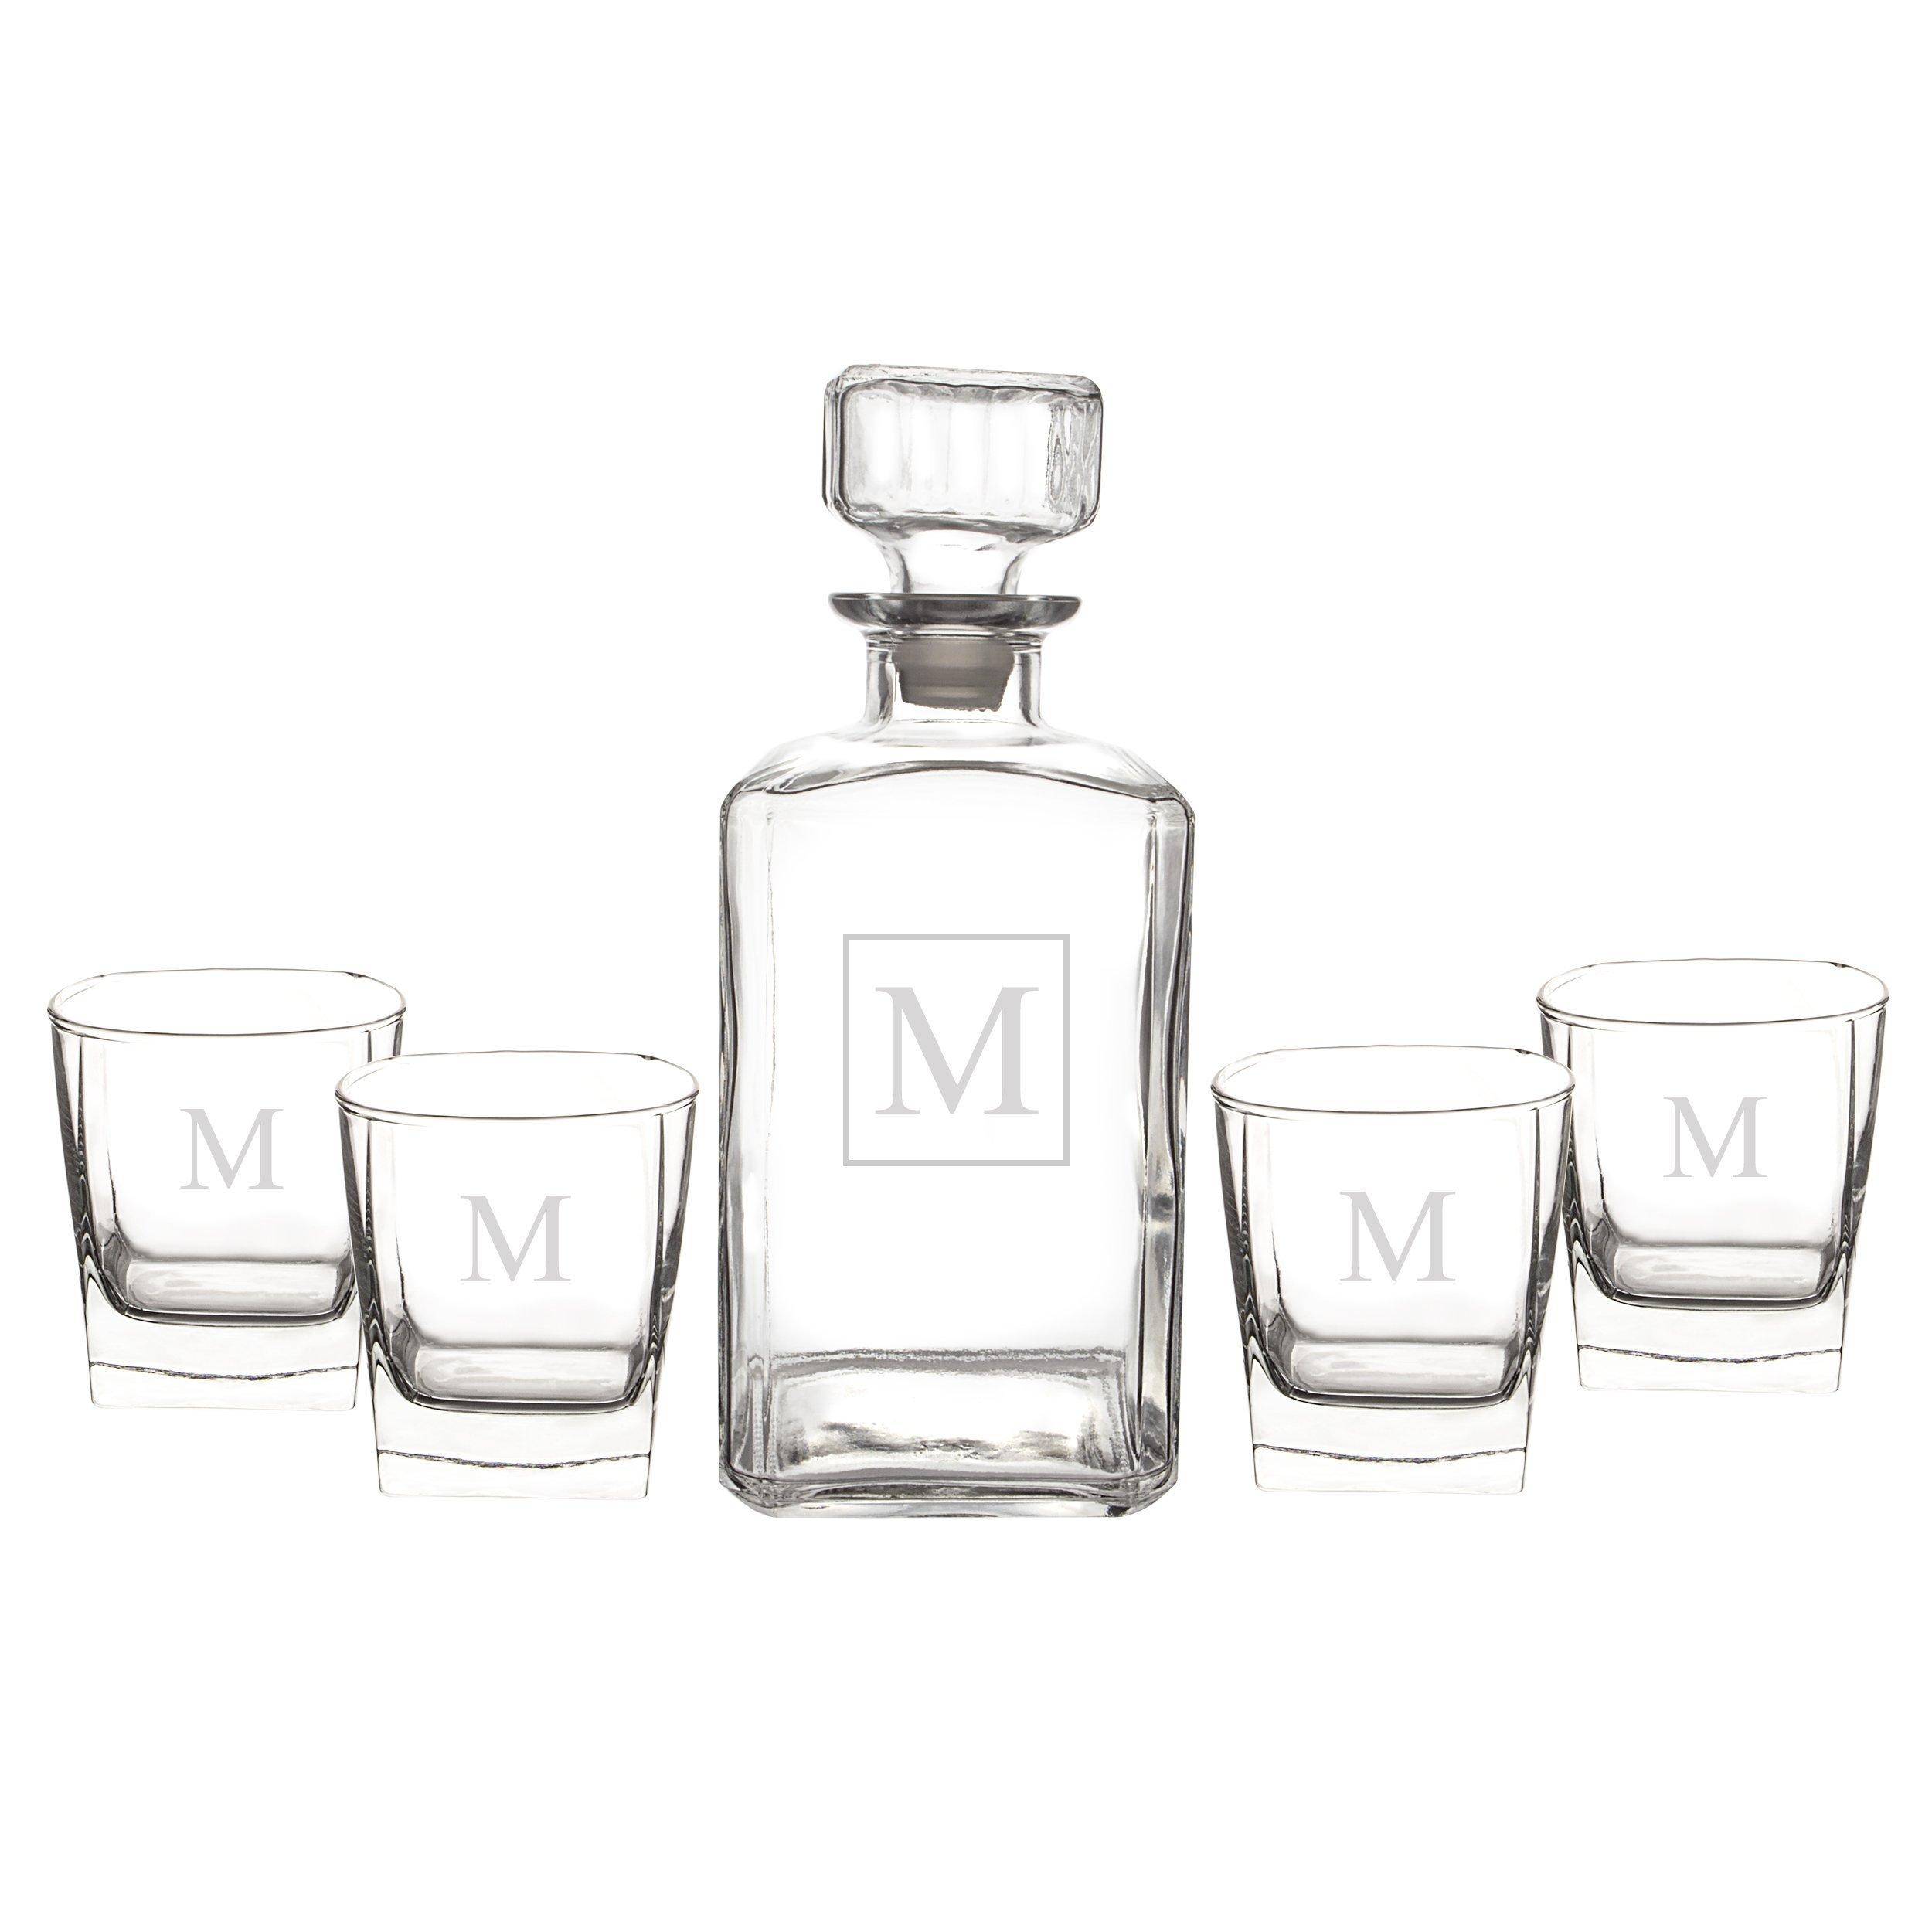 Cathy's Concepts Personalized Liquor Decanter & Glasses Set, Letter M